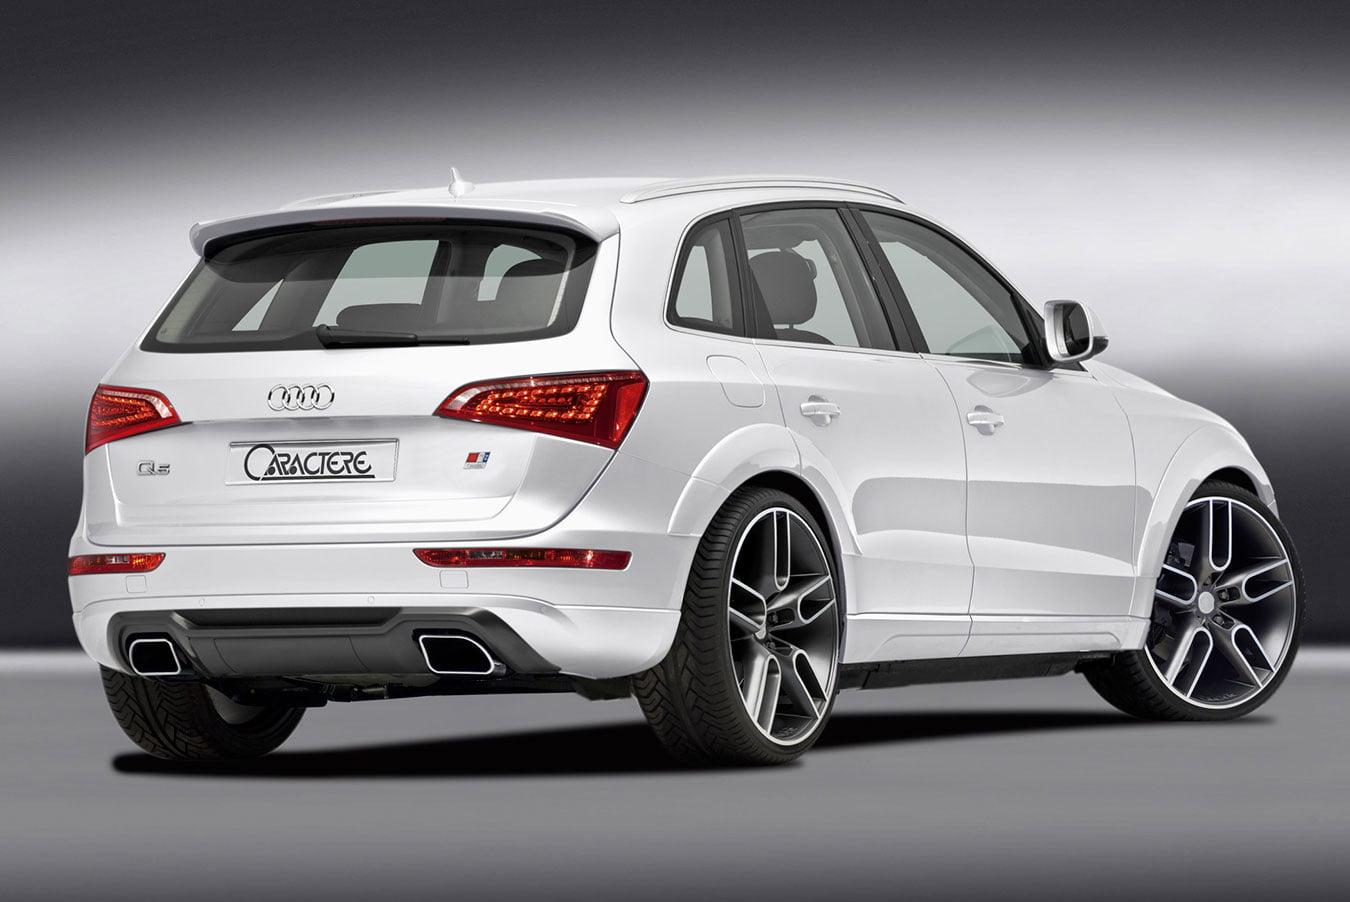 Caractere Rear Diffuser with Caractere Dual Exhaust, fits Audi Q5 B8.0/B8.5 3.0 TDI / 2.0 TFSI / 3.2 FSI